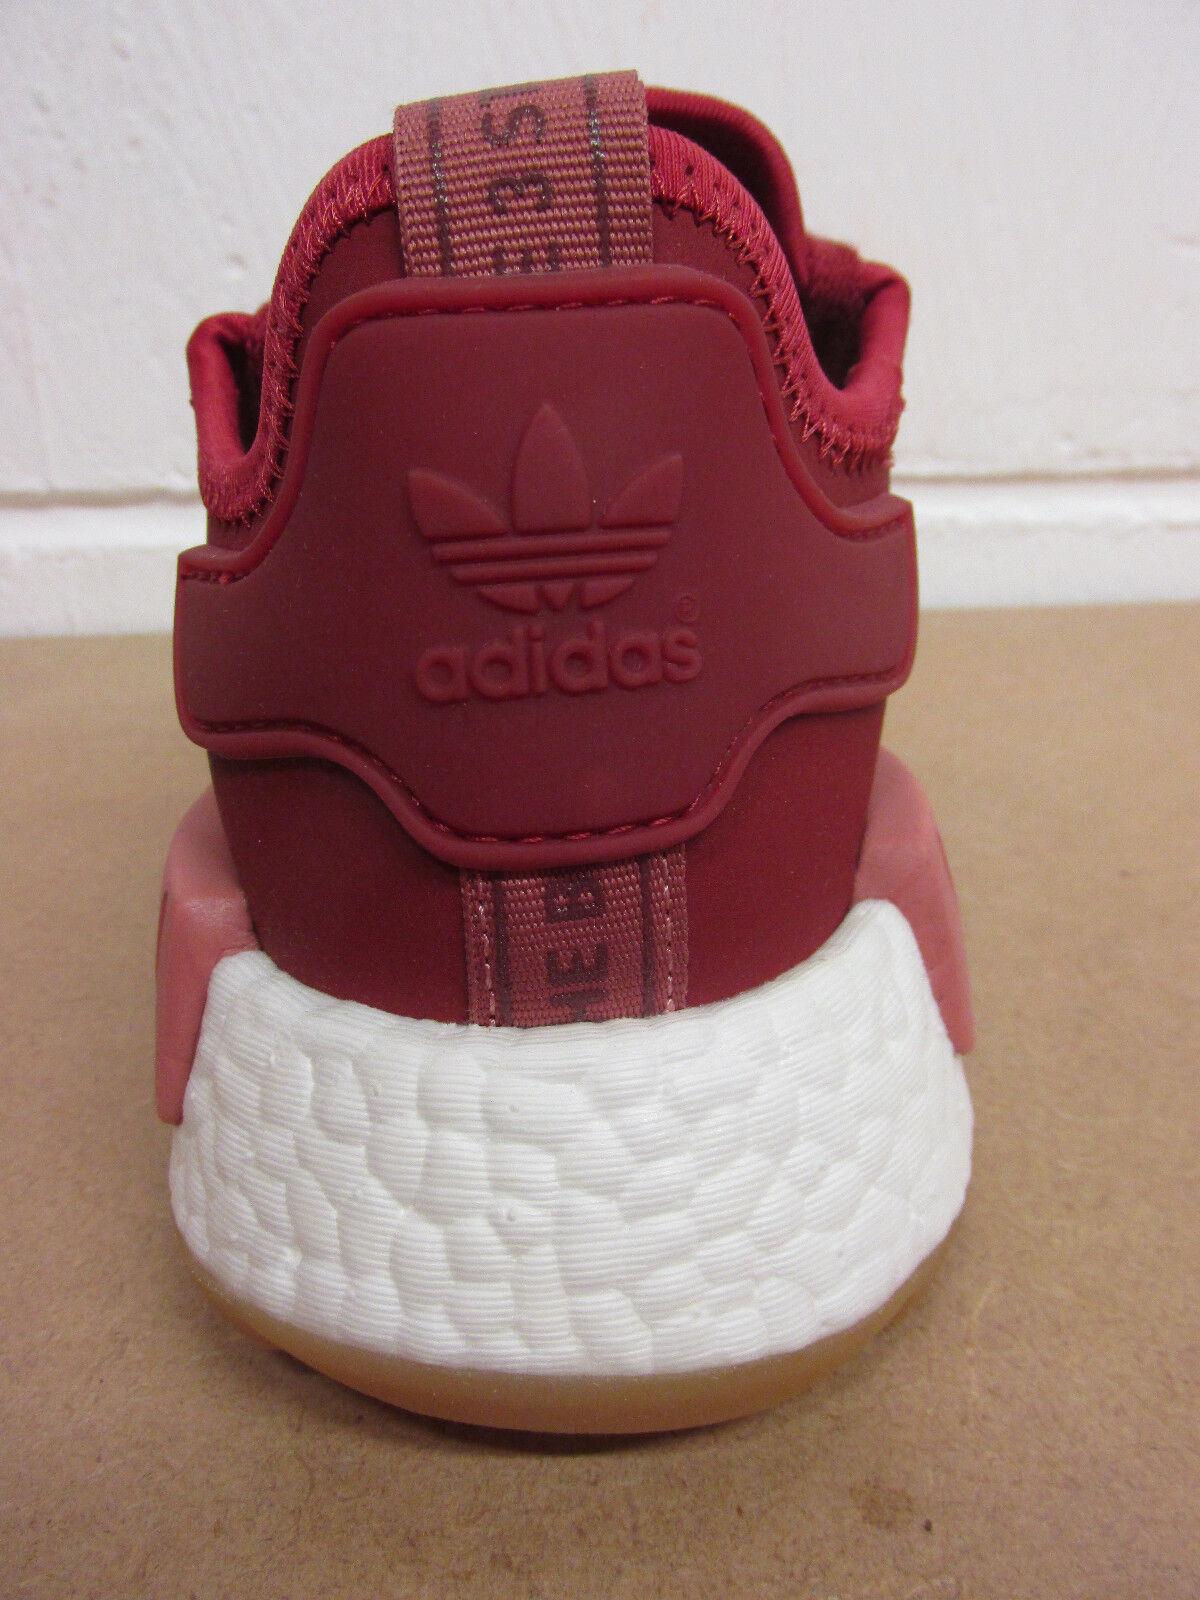 Adidas Originali Nmd _R1 Trail W Unisex S81047 Ginnastica Scarpe da Ginnastica S81047 Corsa fa4a90